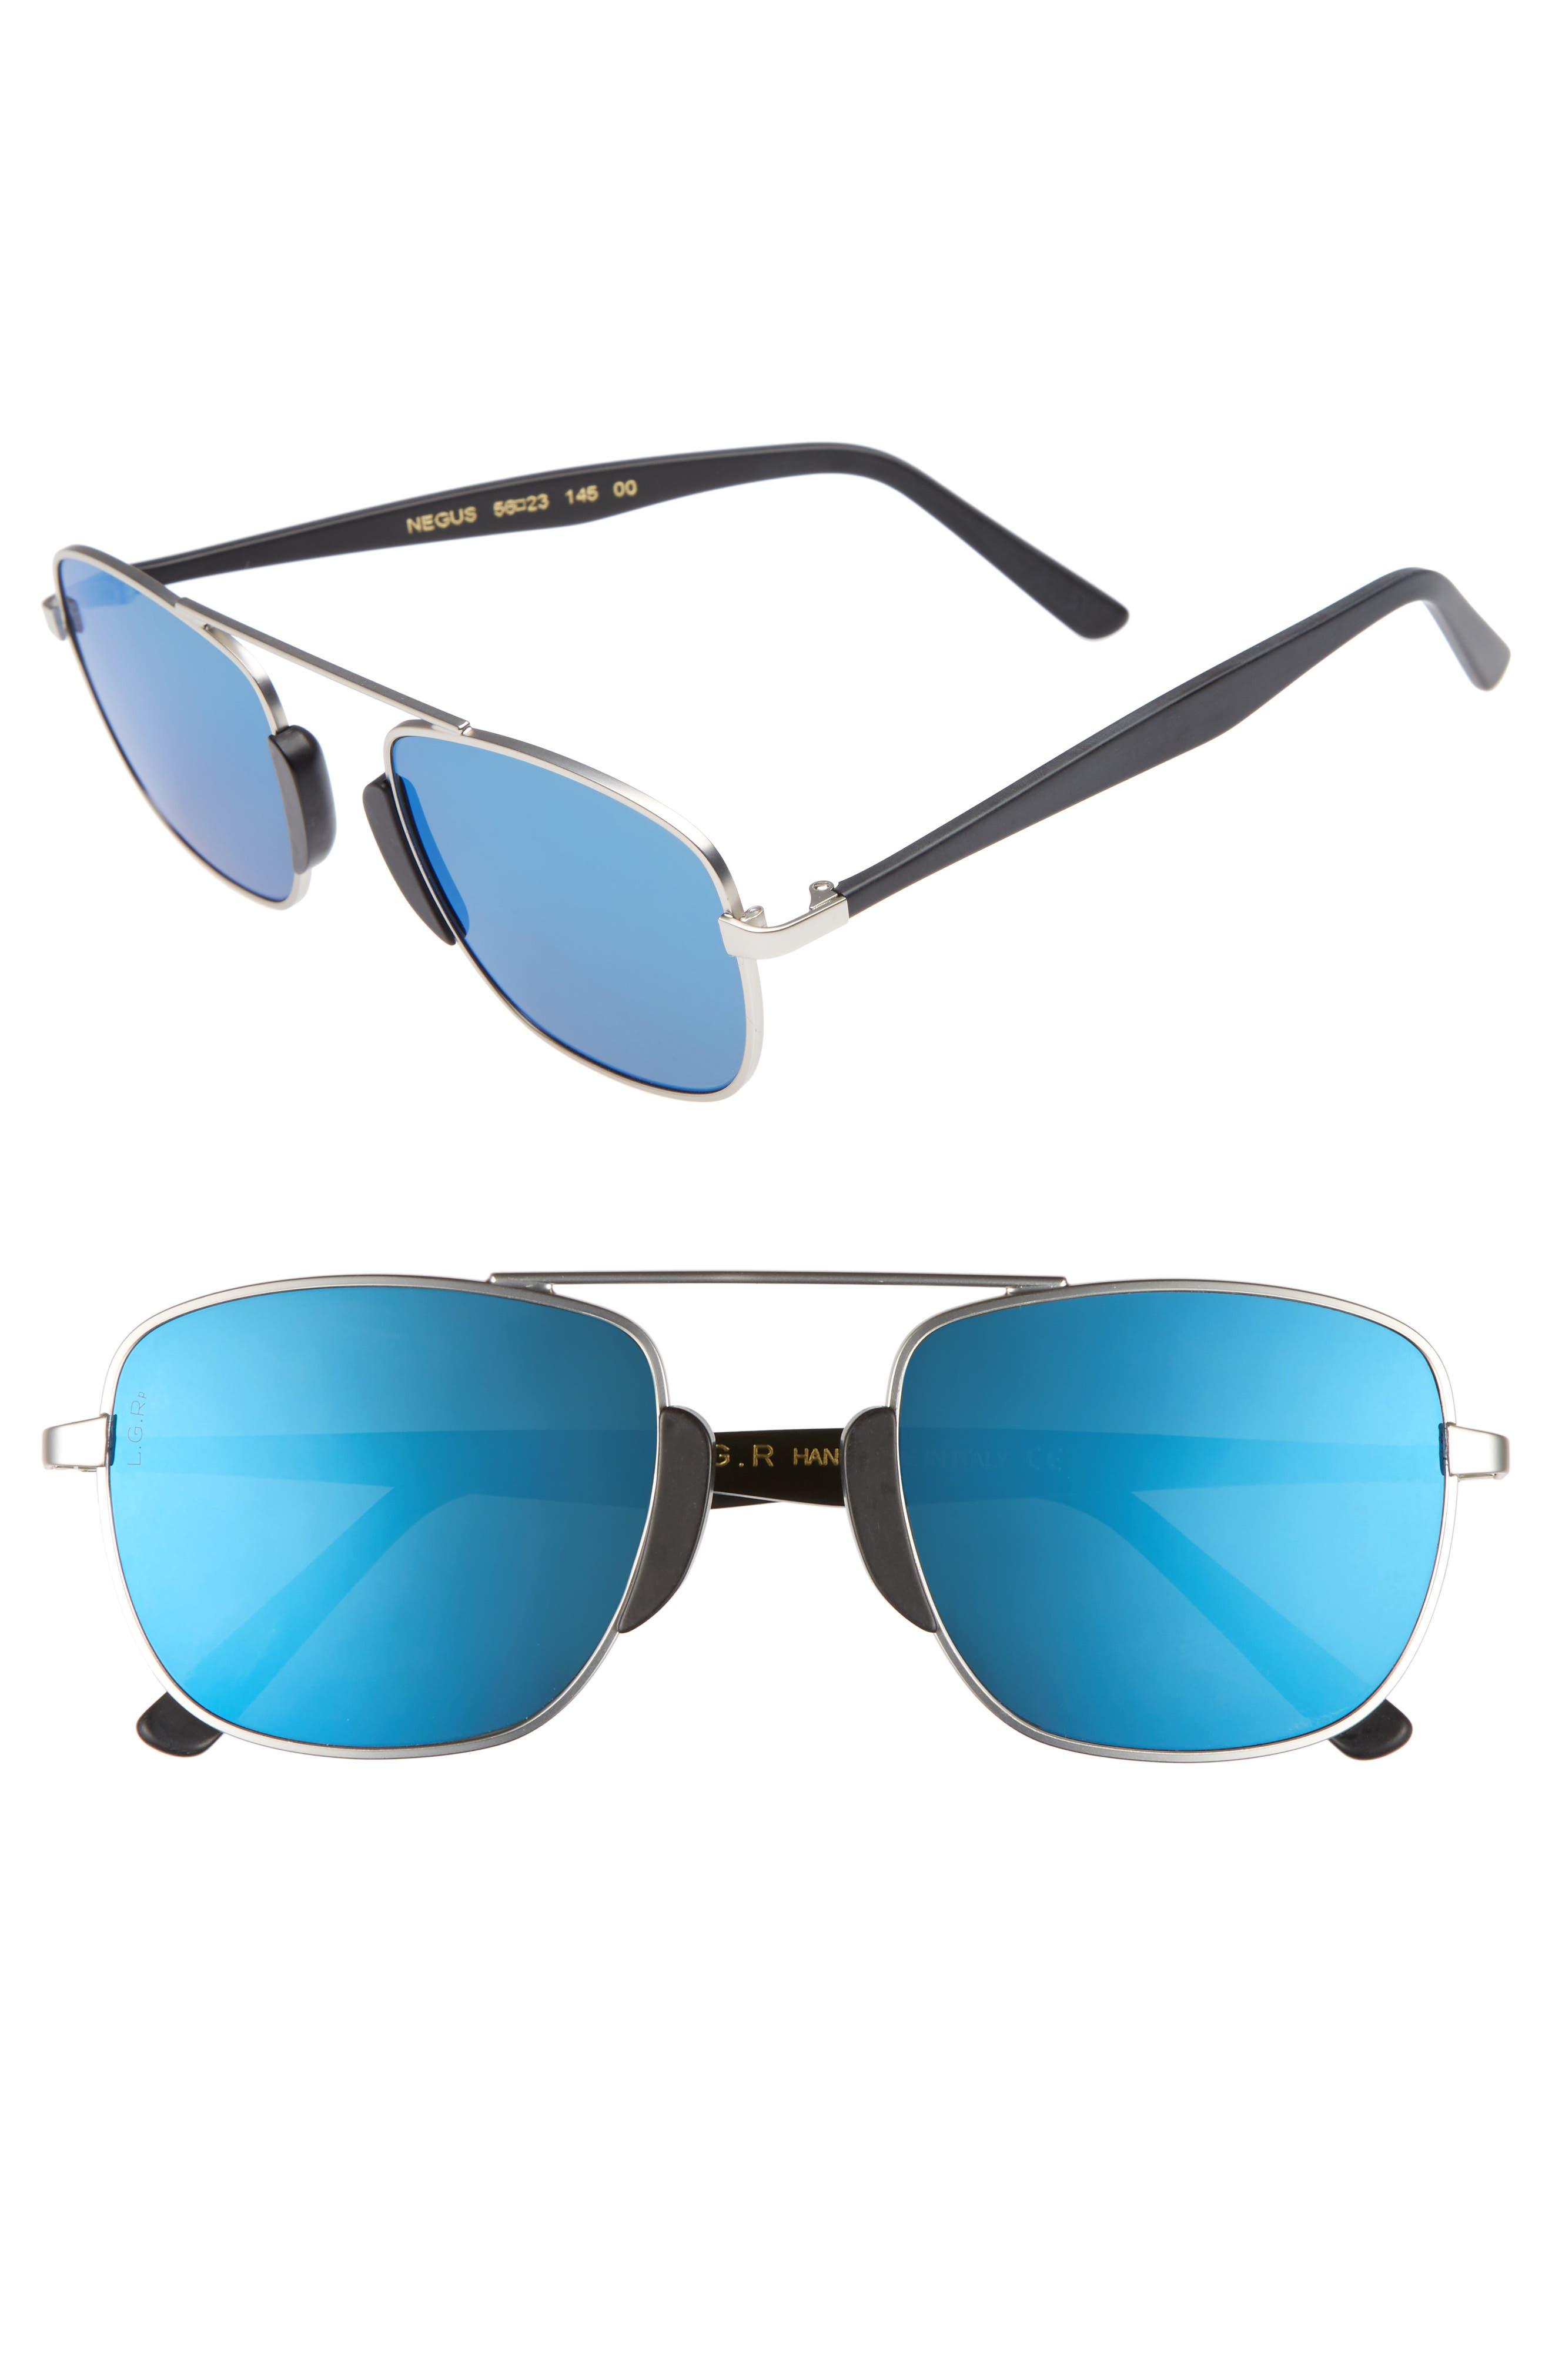 Negus 53mm Polarized Sunglasses,                             Main thumbnail 1, color,                             Silver Matte/ Blue Mirror